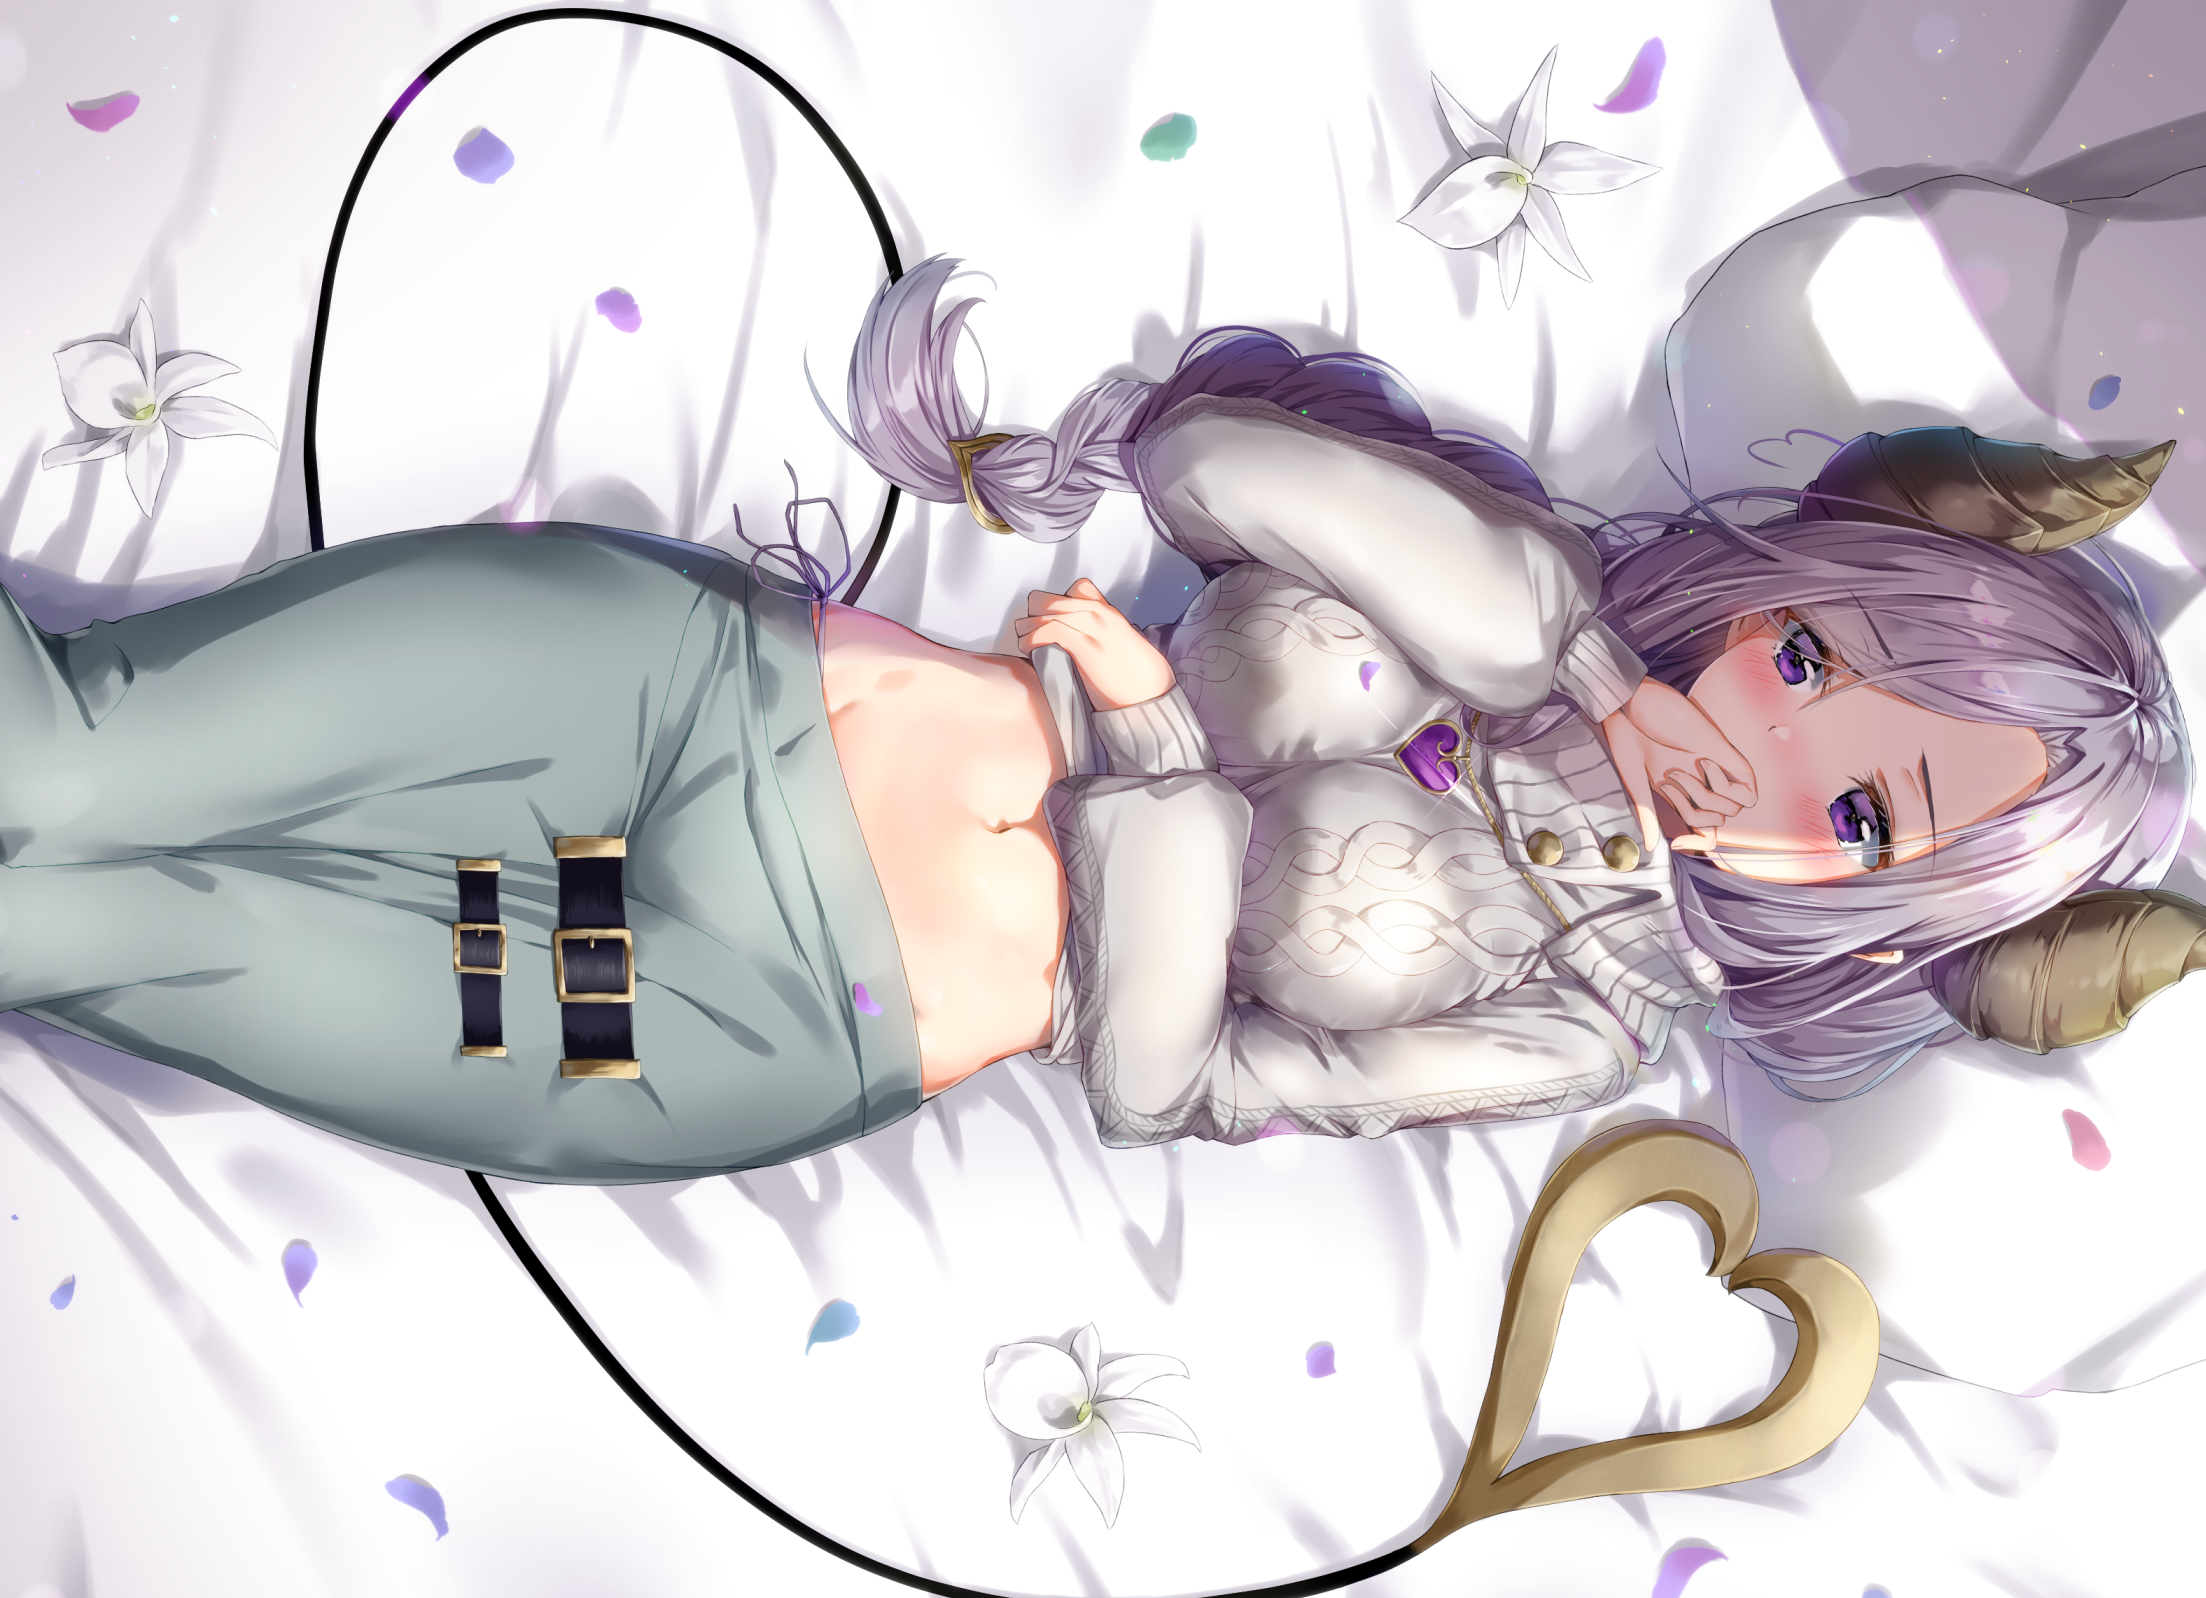 Anime 2206x1598 Honey Strap tail horns bed belly blush purple hair short hair flowers purple eyes petals in bed sweater anime girls Kuria Saionji Mary (Honey Strap)